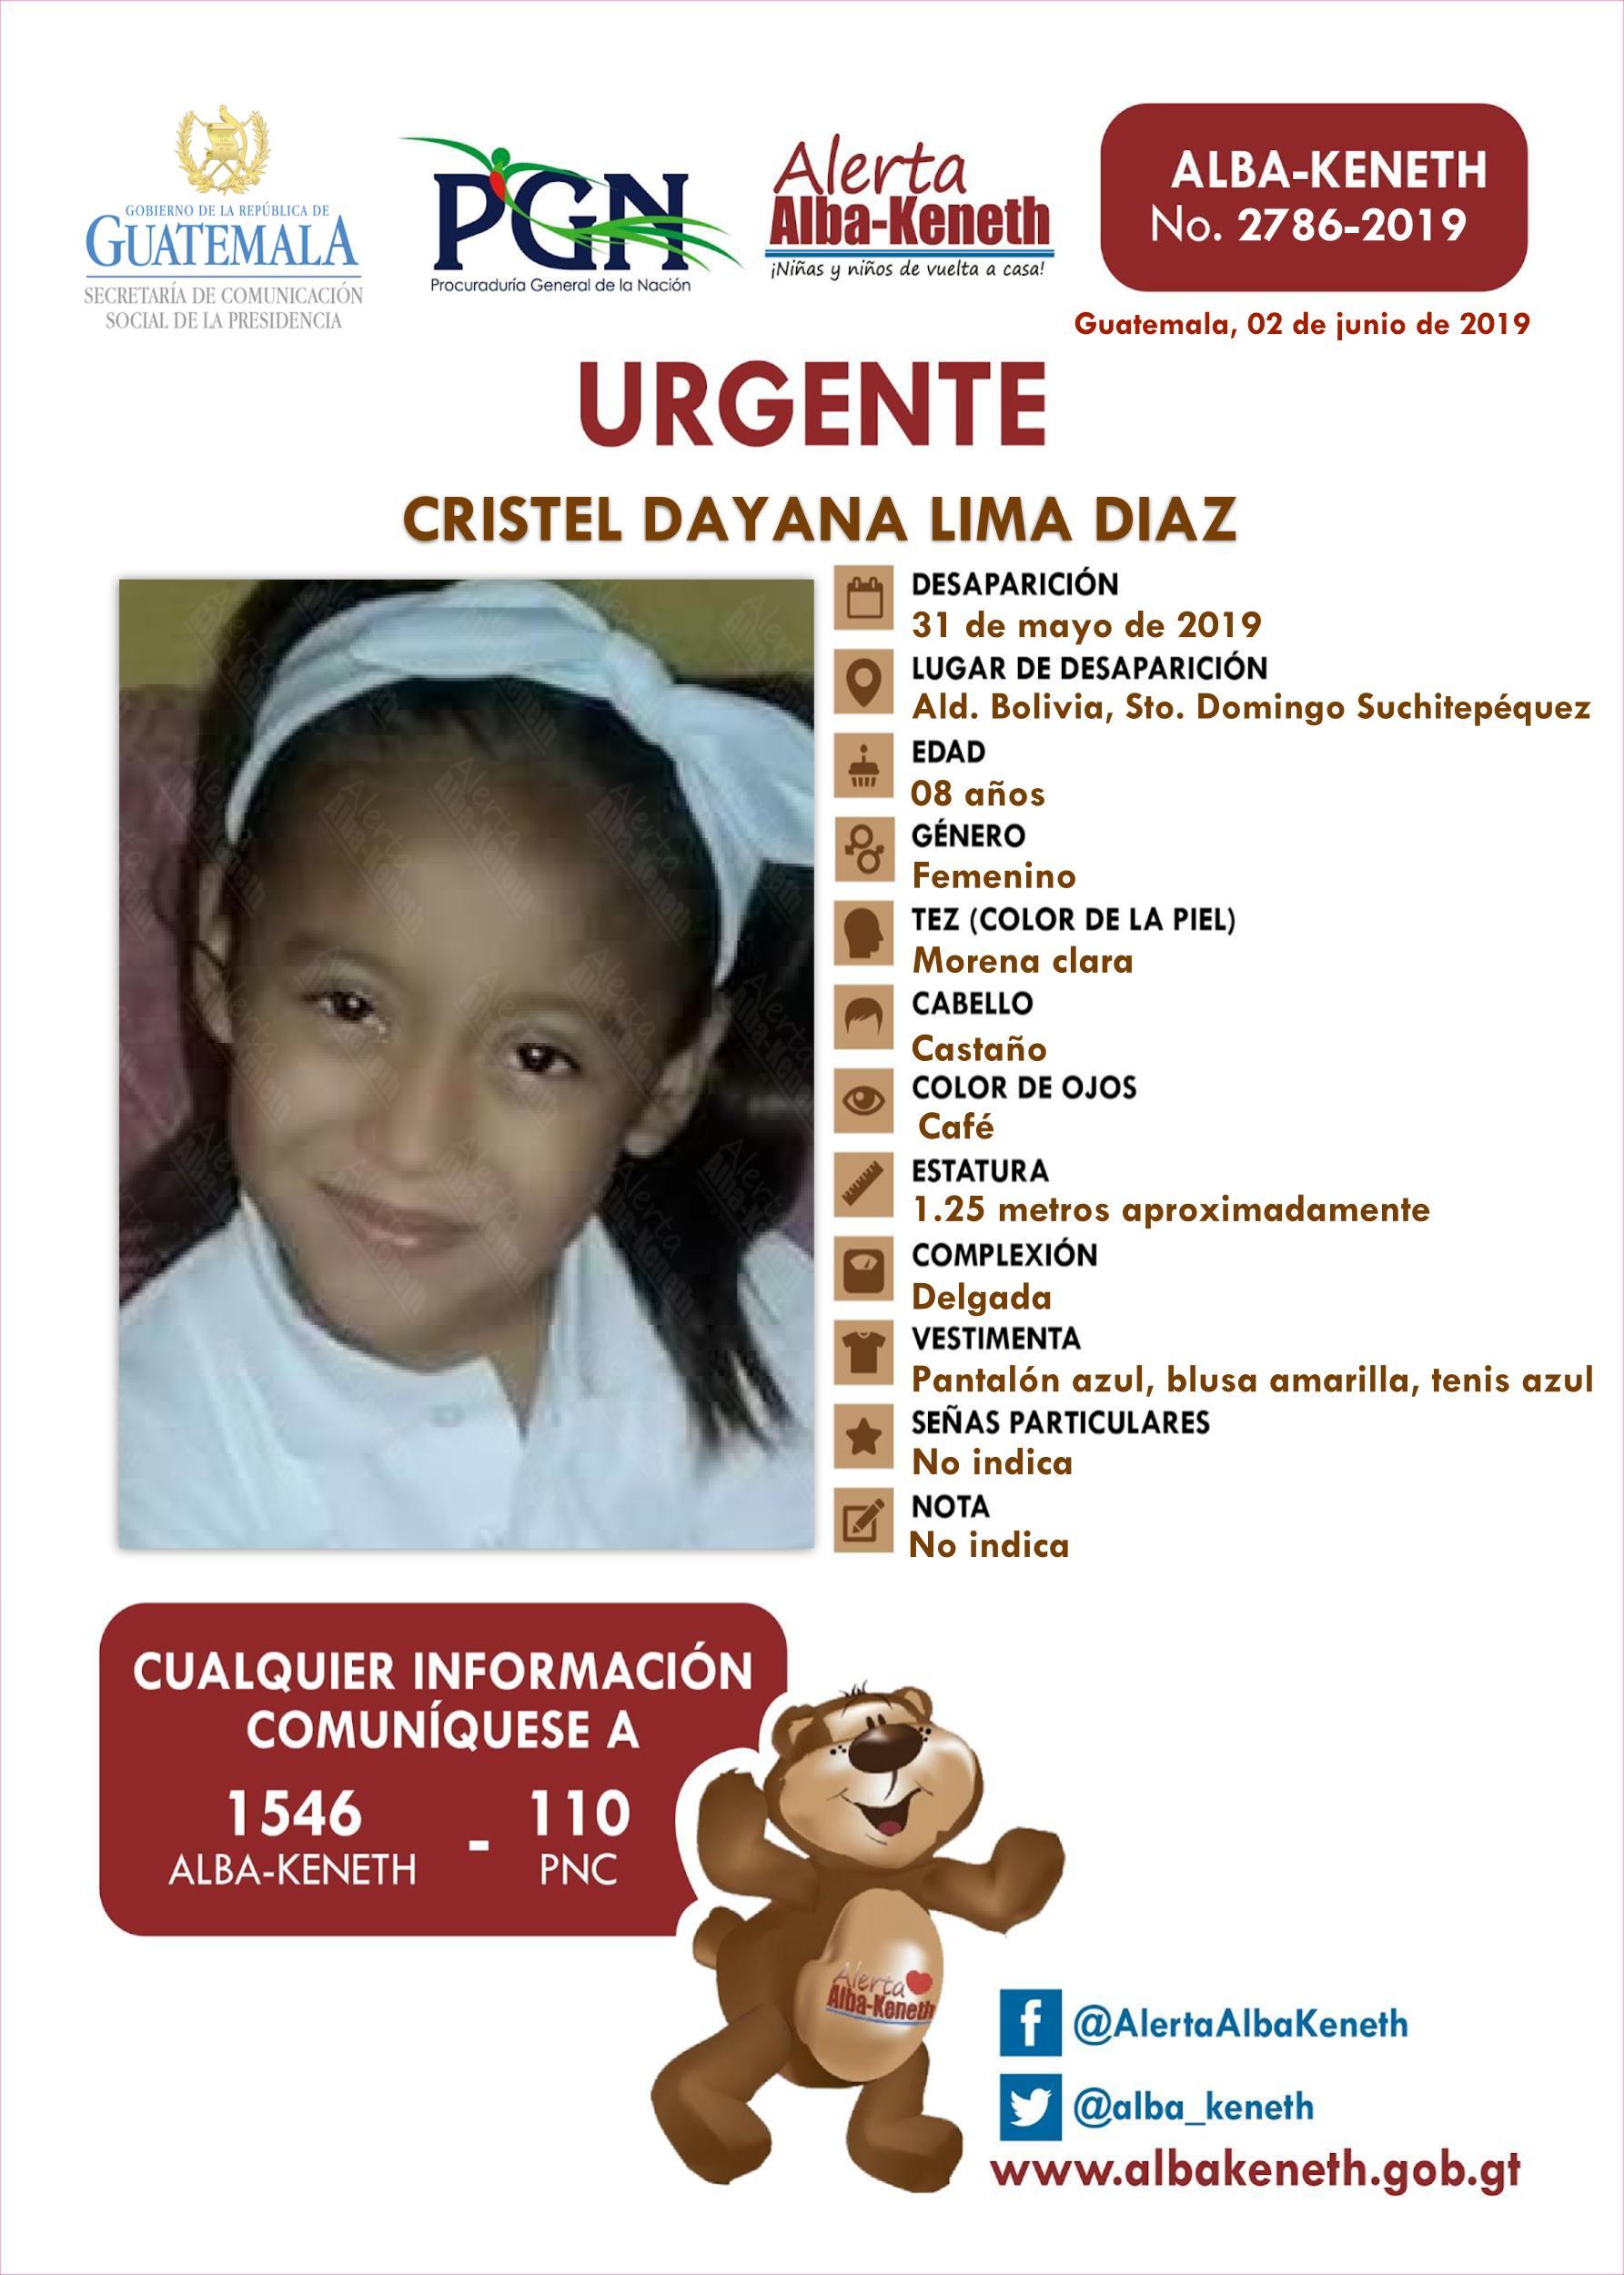 Cristel Dayana Lima Diaz